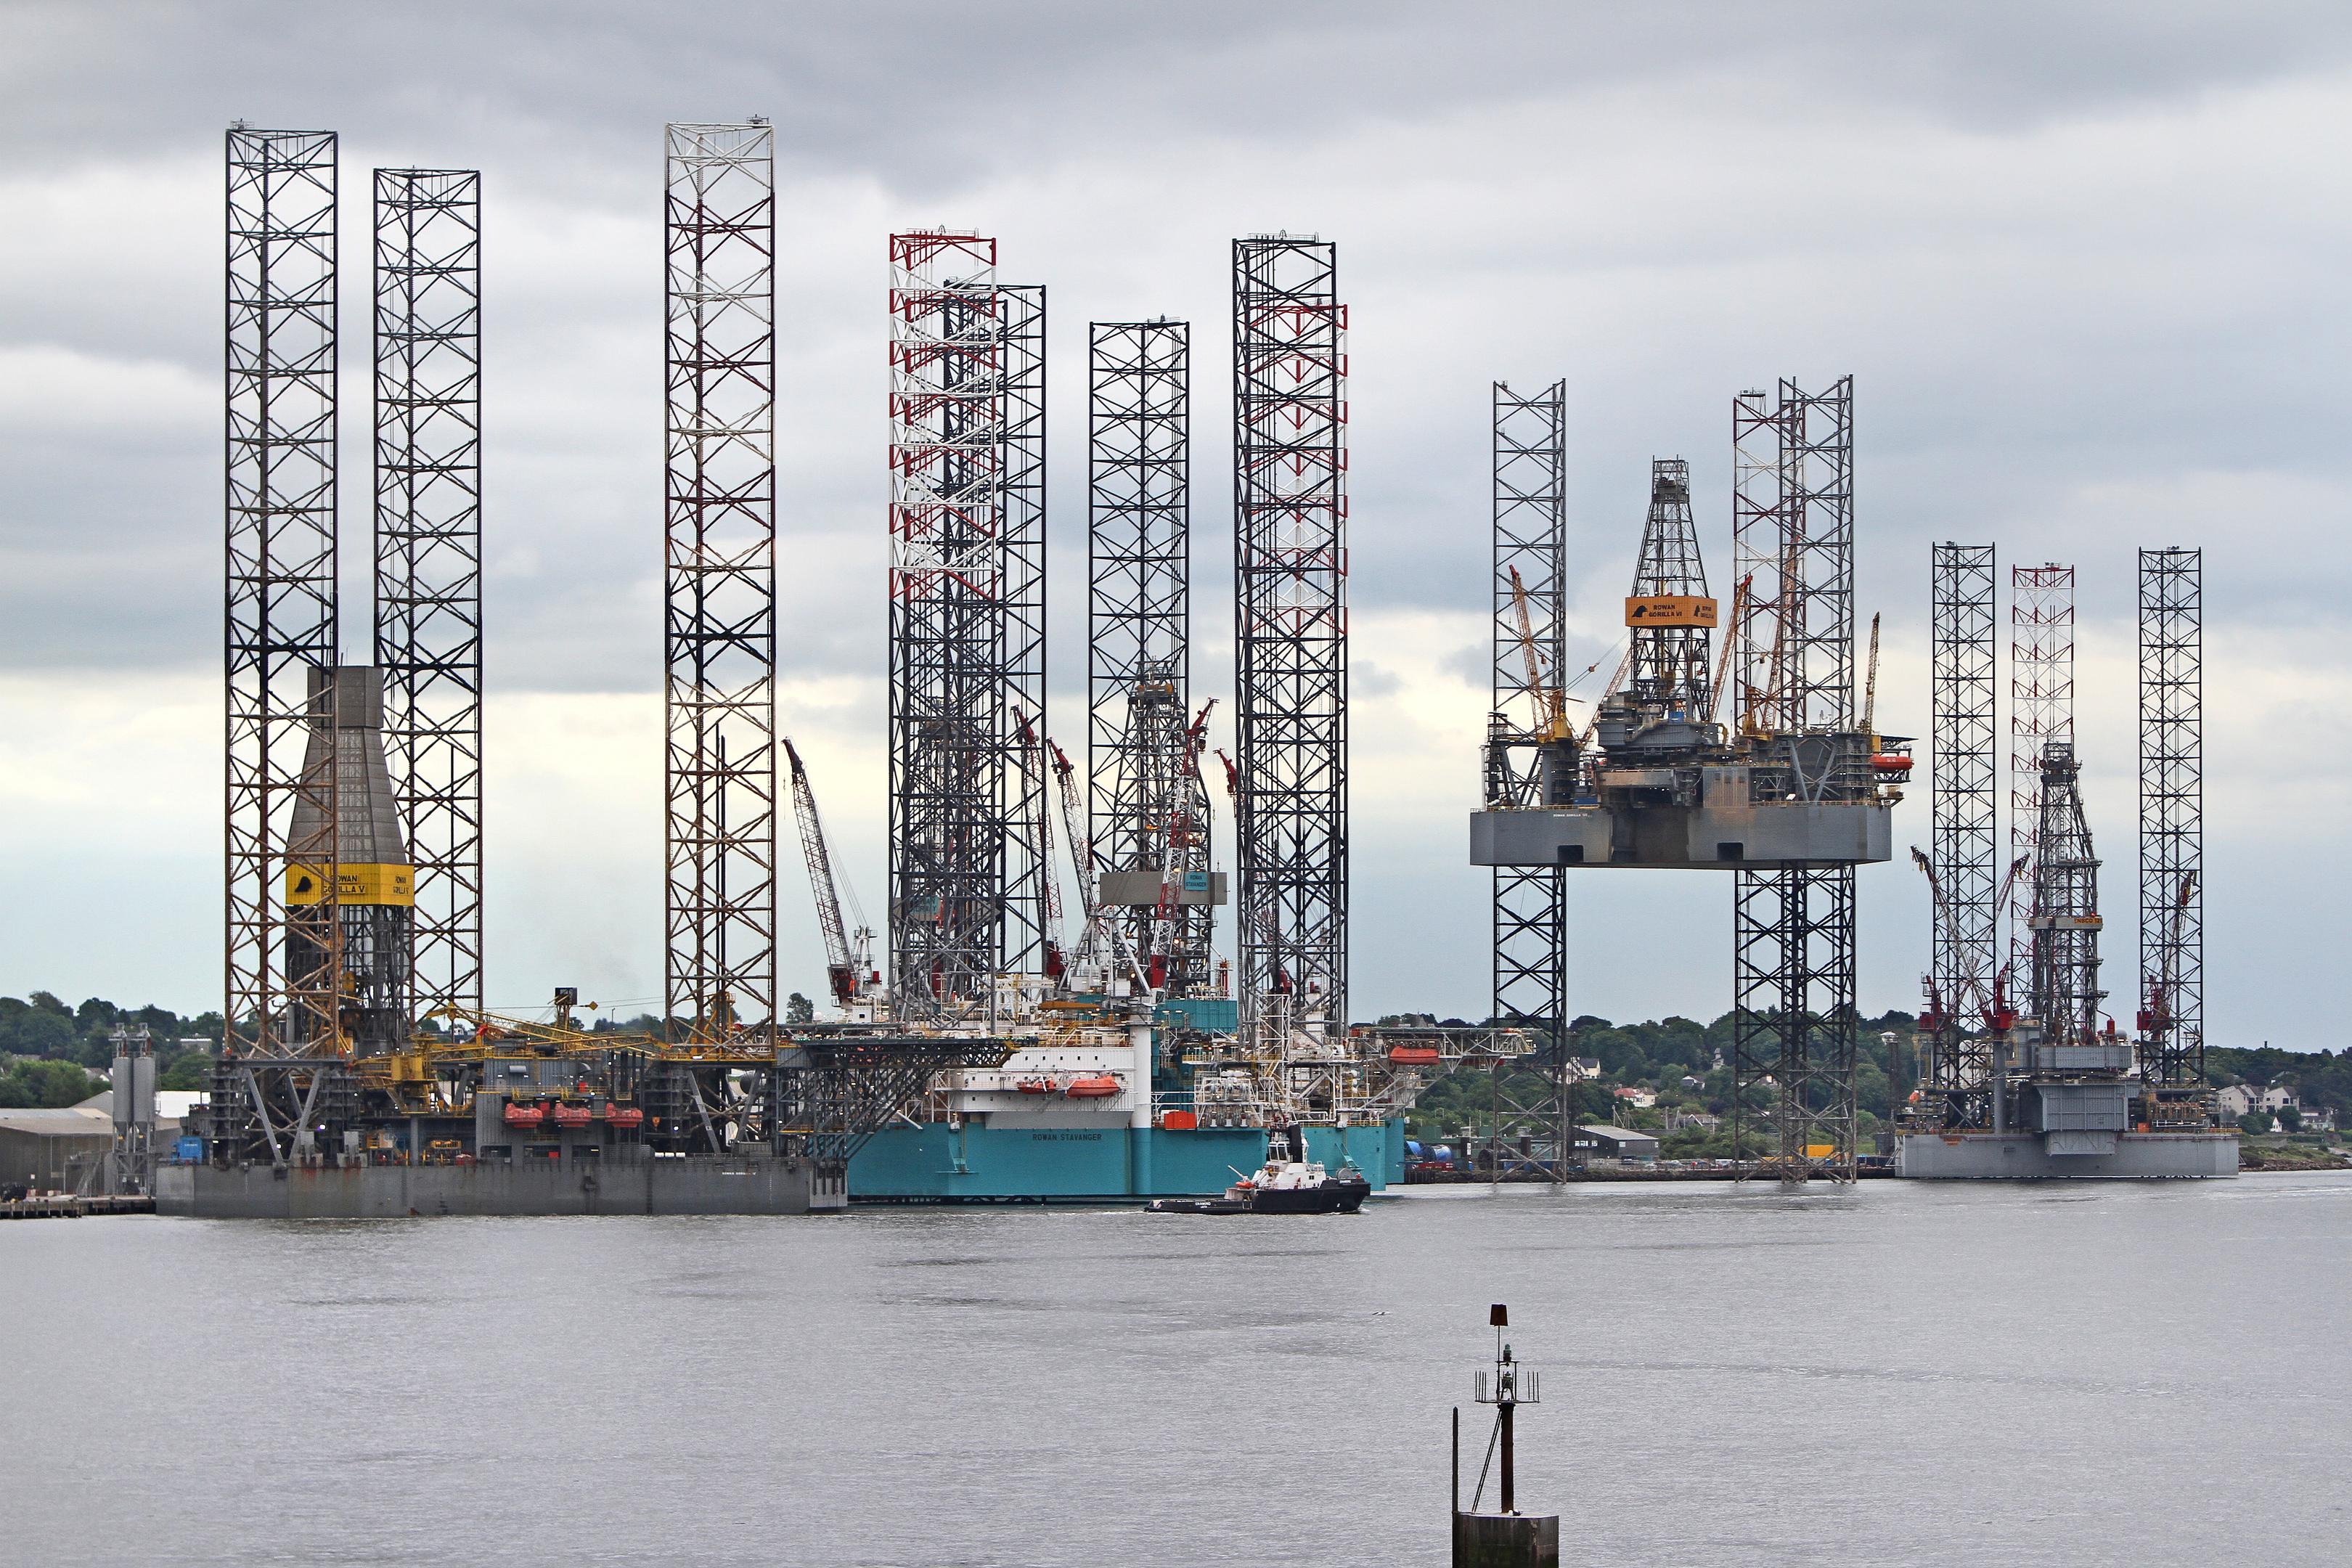 The Rowan Gorilla V berths at Dundee Port.